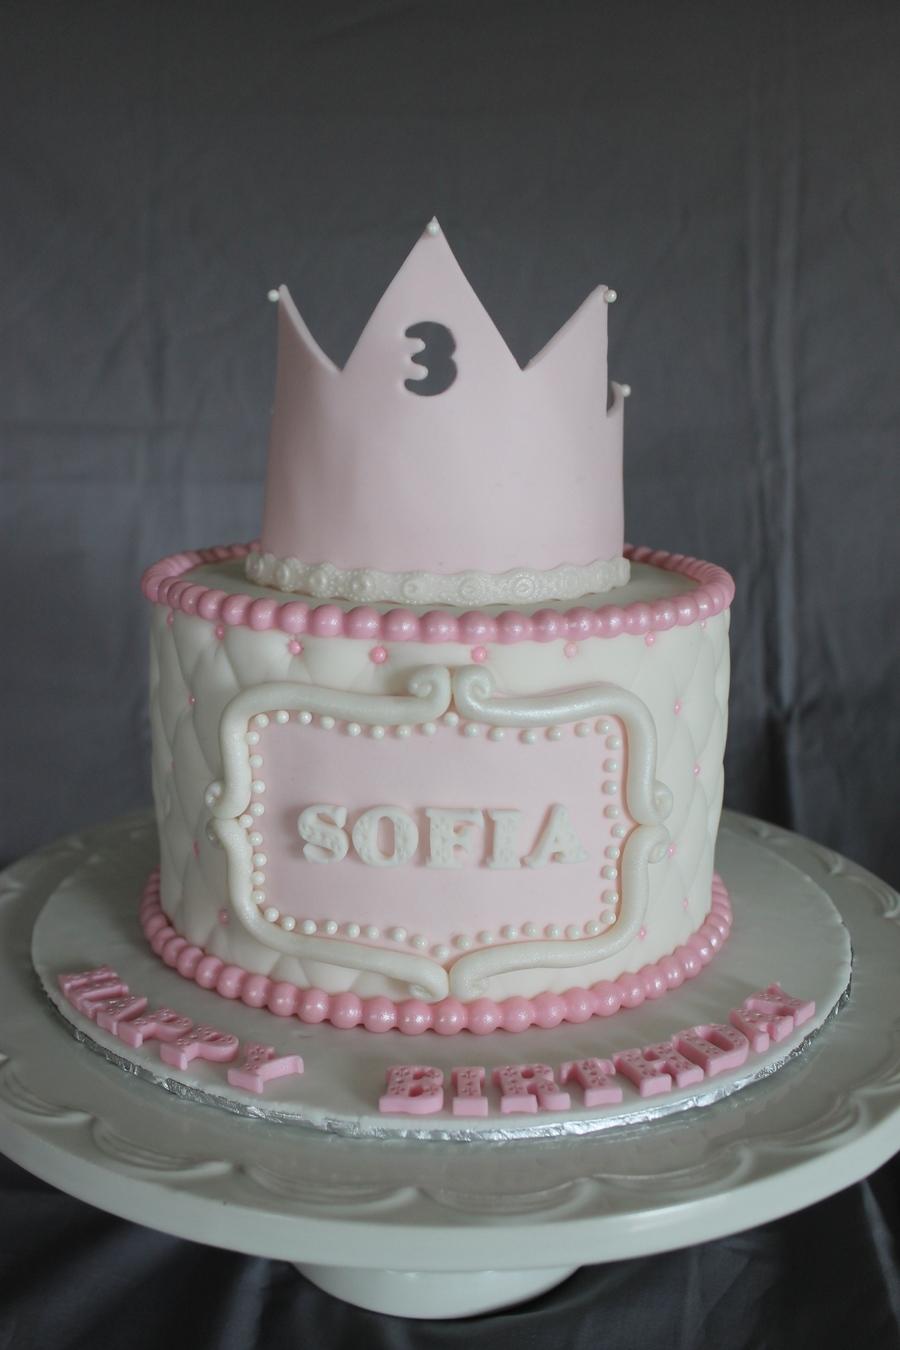 Phenomenal Princess Themed Birthday Cake Cakecentral Com Funny Birthday Cards Online Inifofree Goldxyz